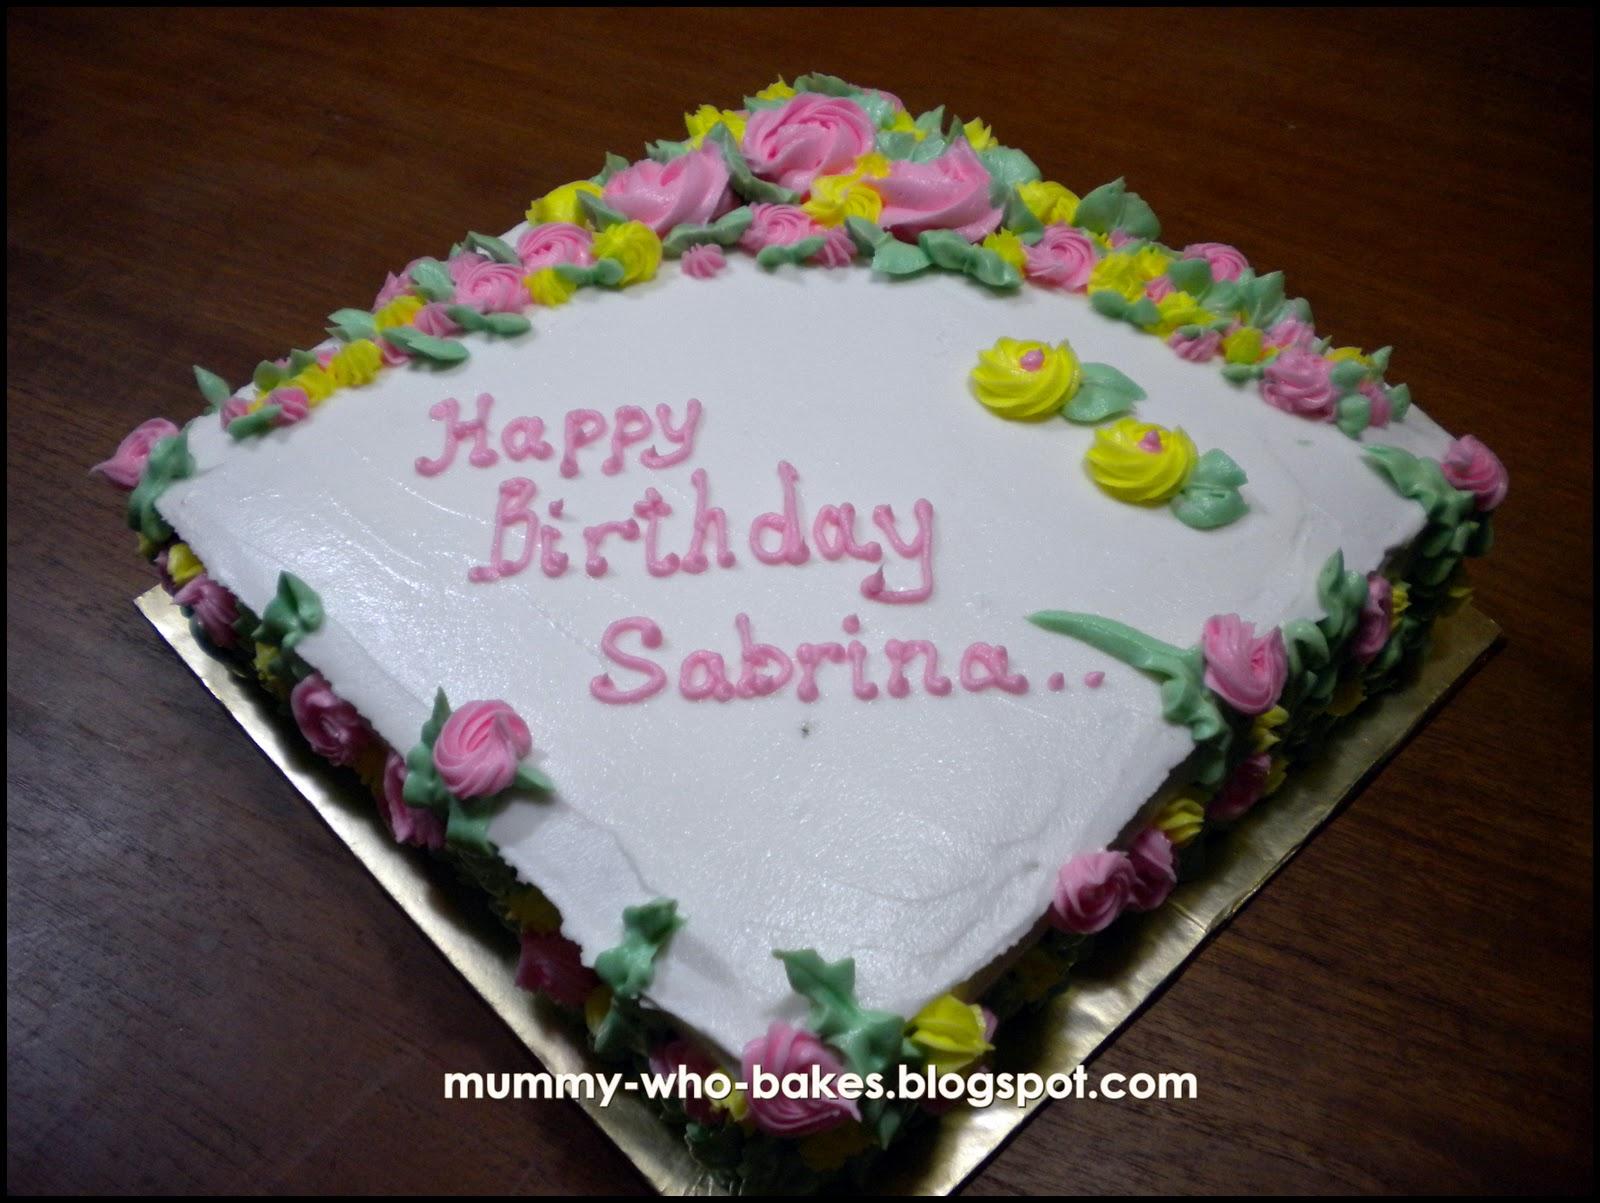 Happy Birthday Sabrina Cake